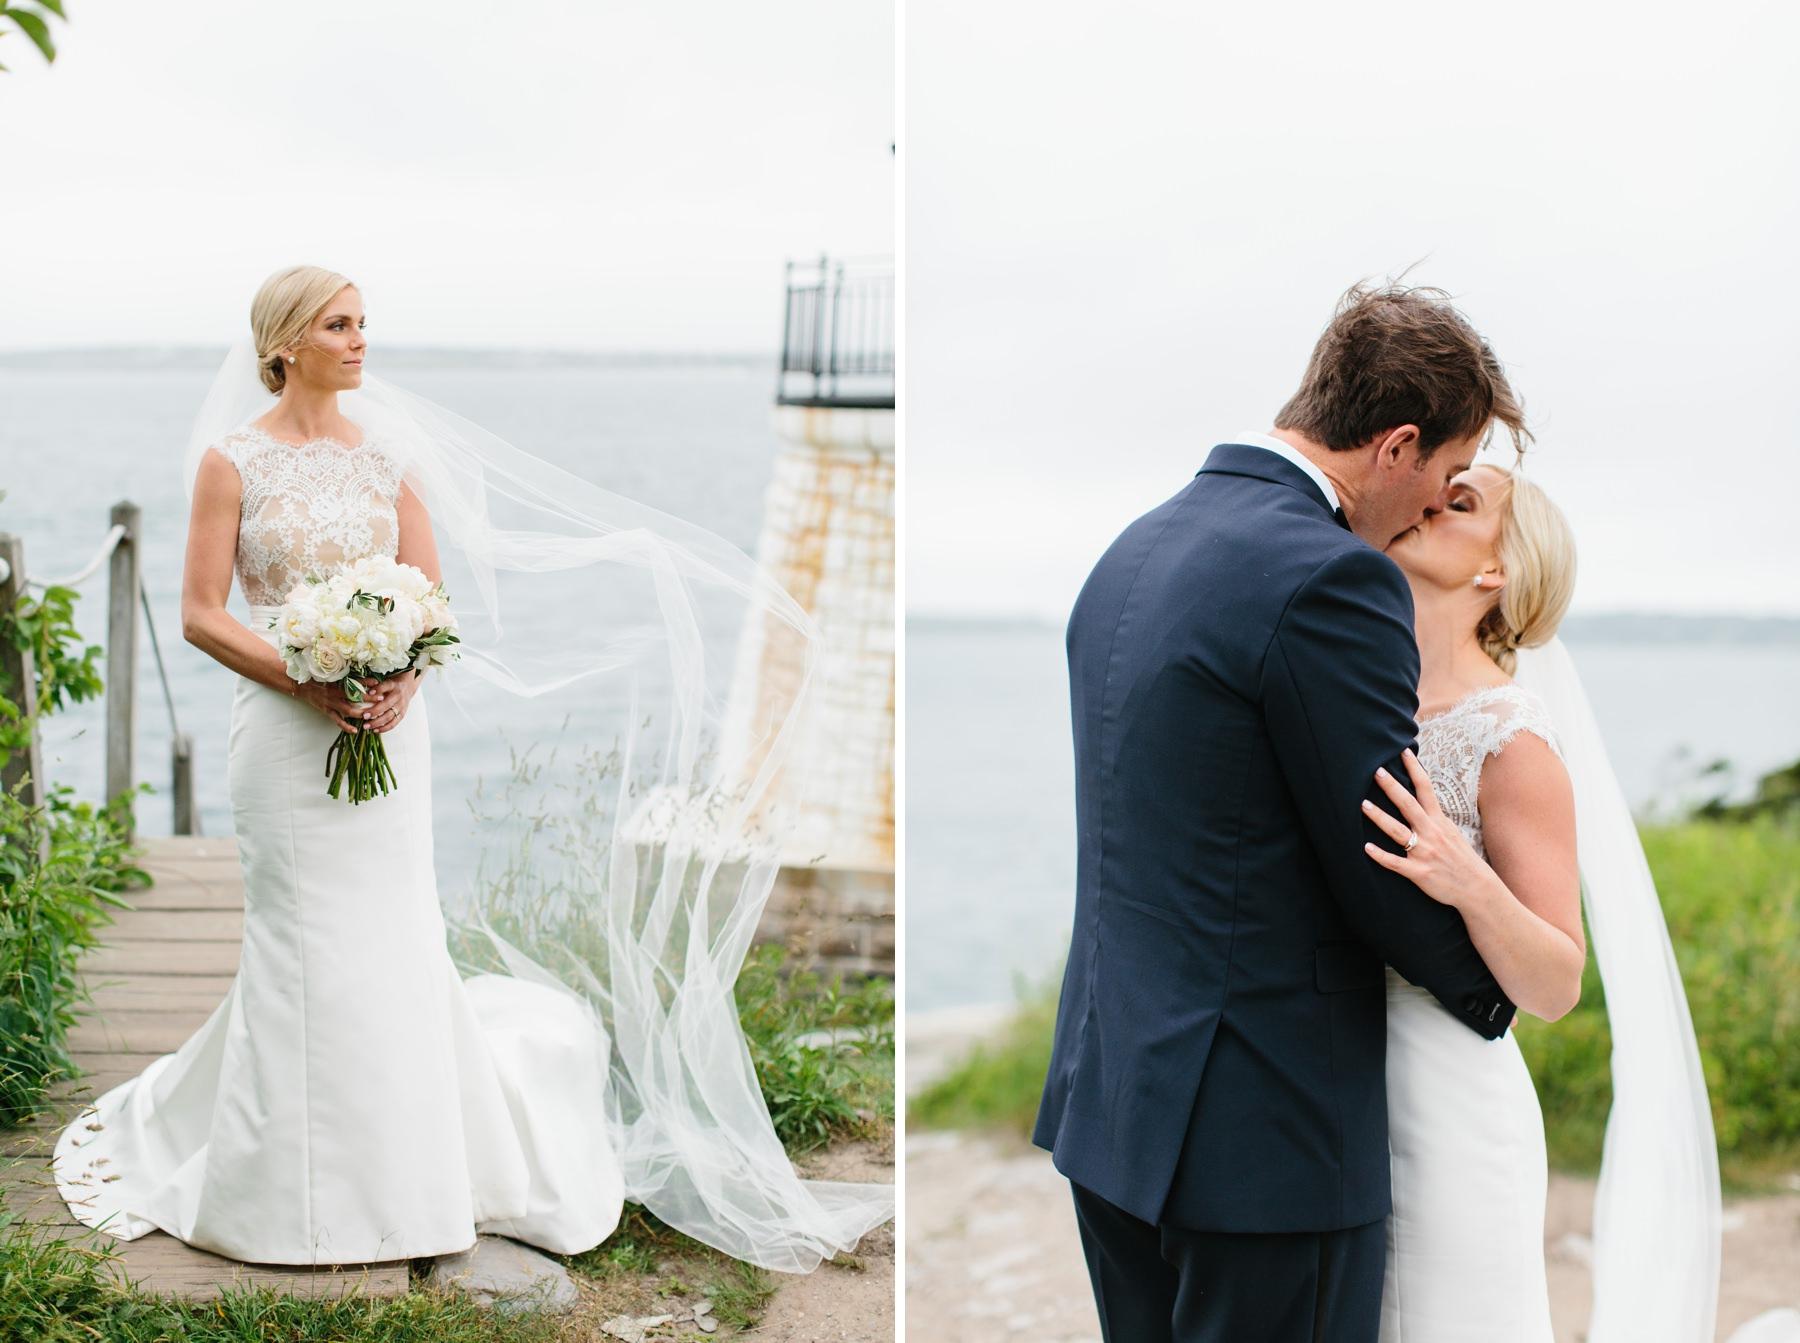 blone bride with sleek dress